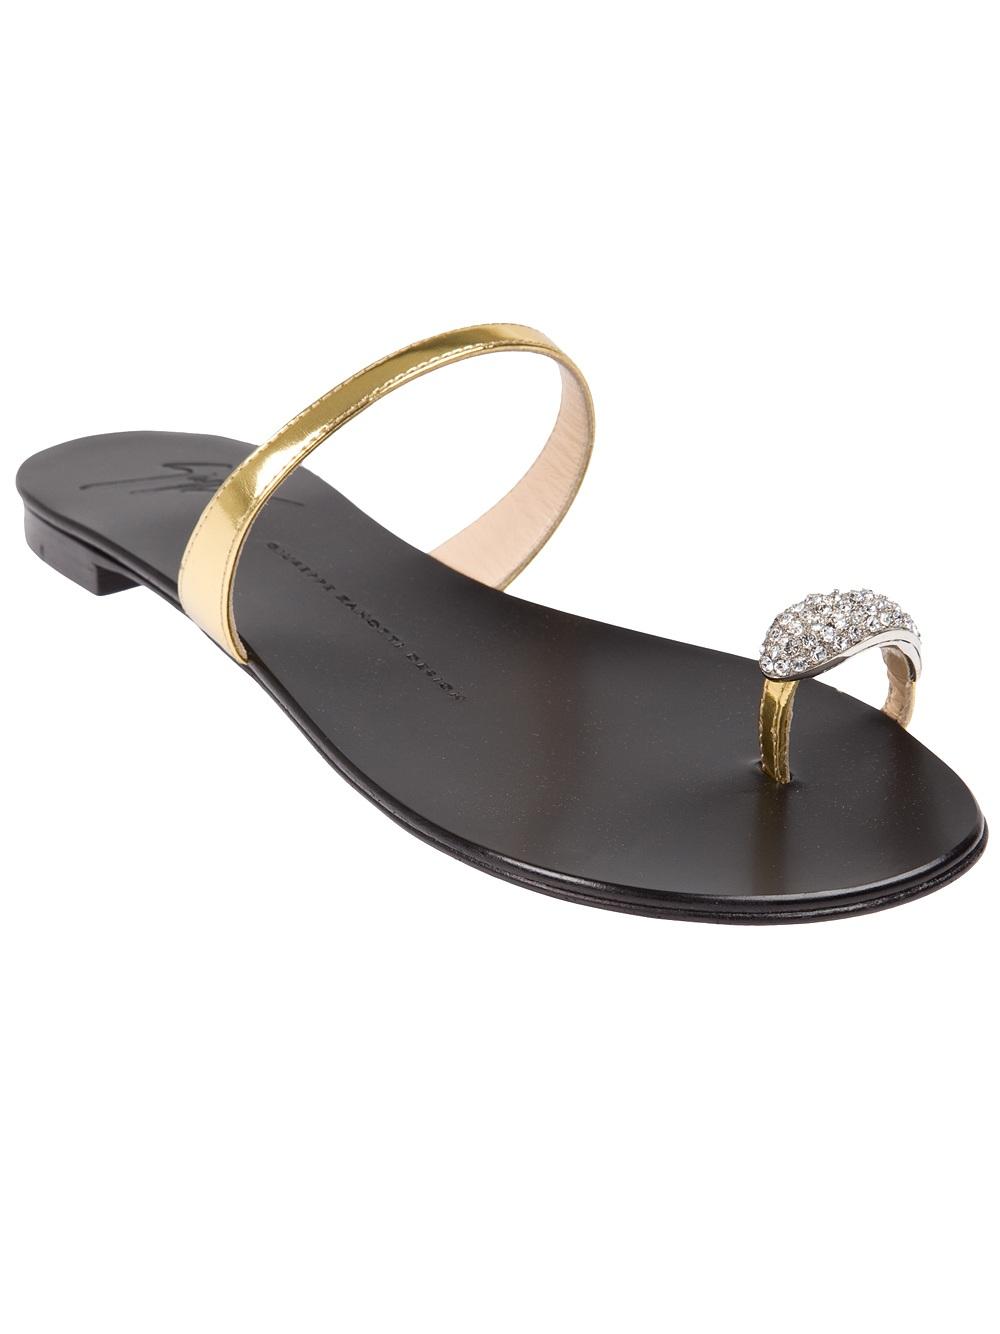 Lyst Giuseppe Zanotti Toe Ring Sandal In Metallic